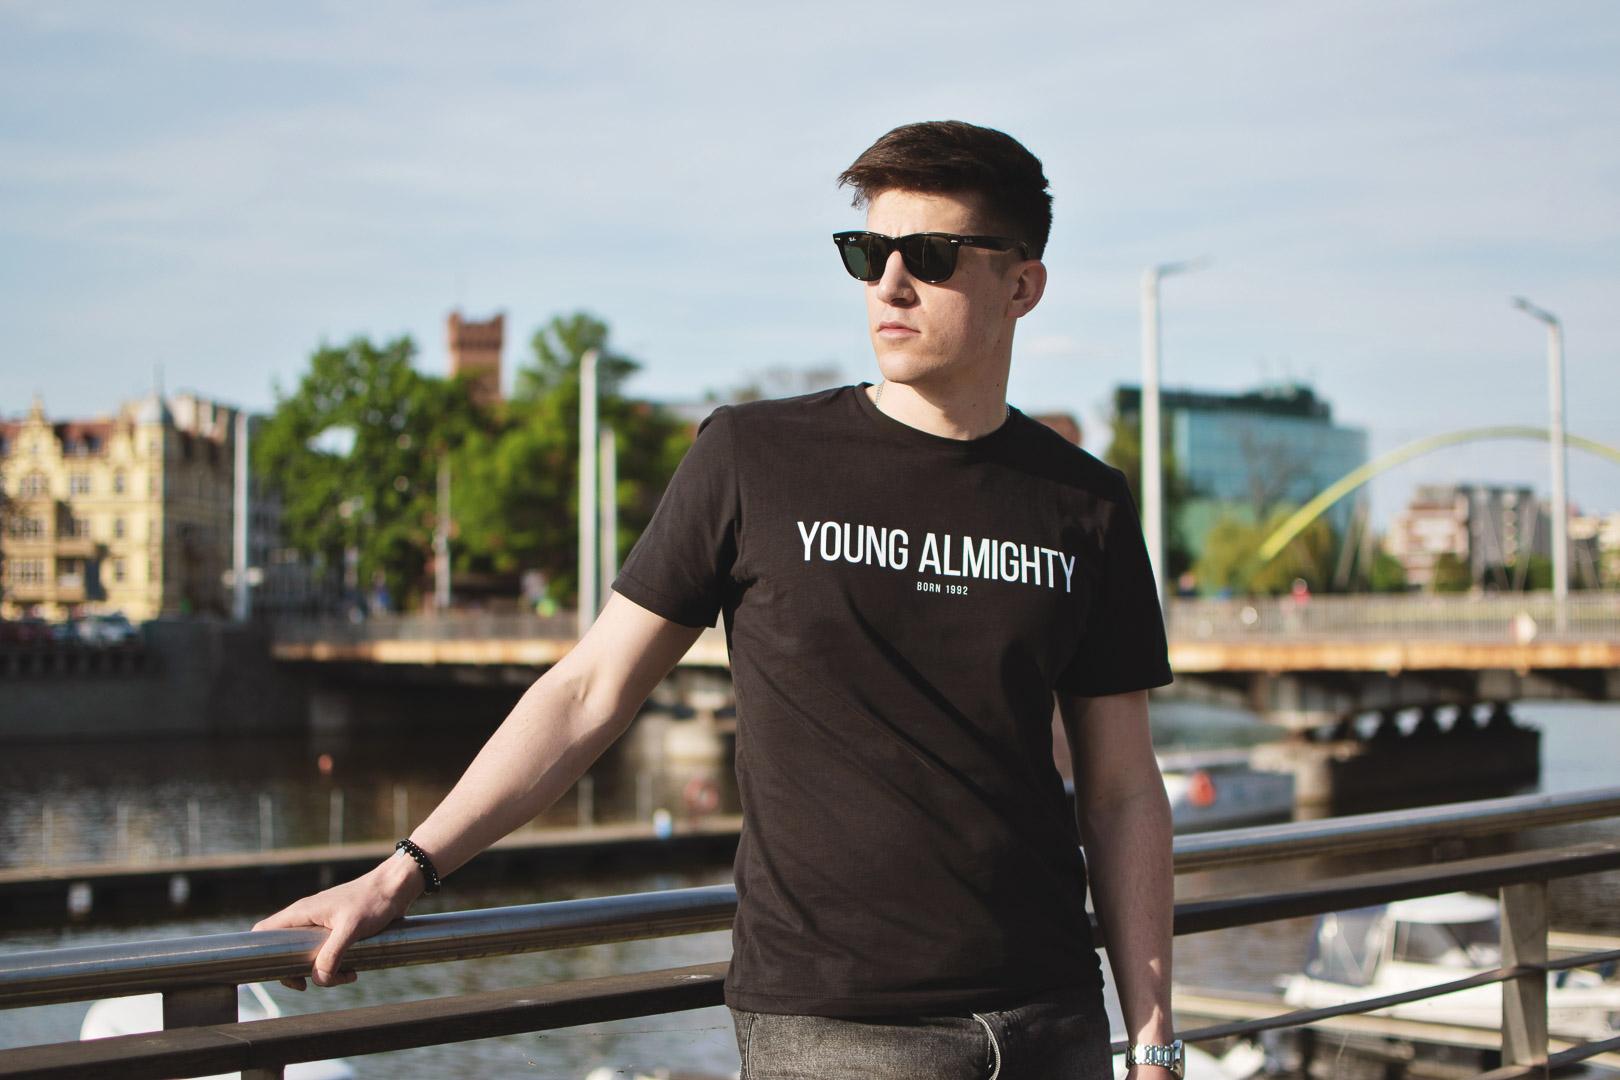 Young Almighty, Koszulka, Moodel, Blog męski, Blog, Ray Ban, instagram, styl, mężczyzna